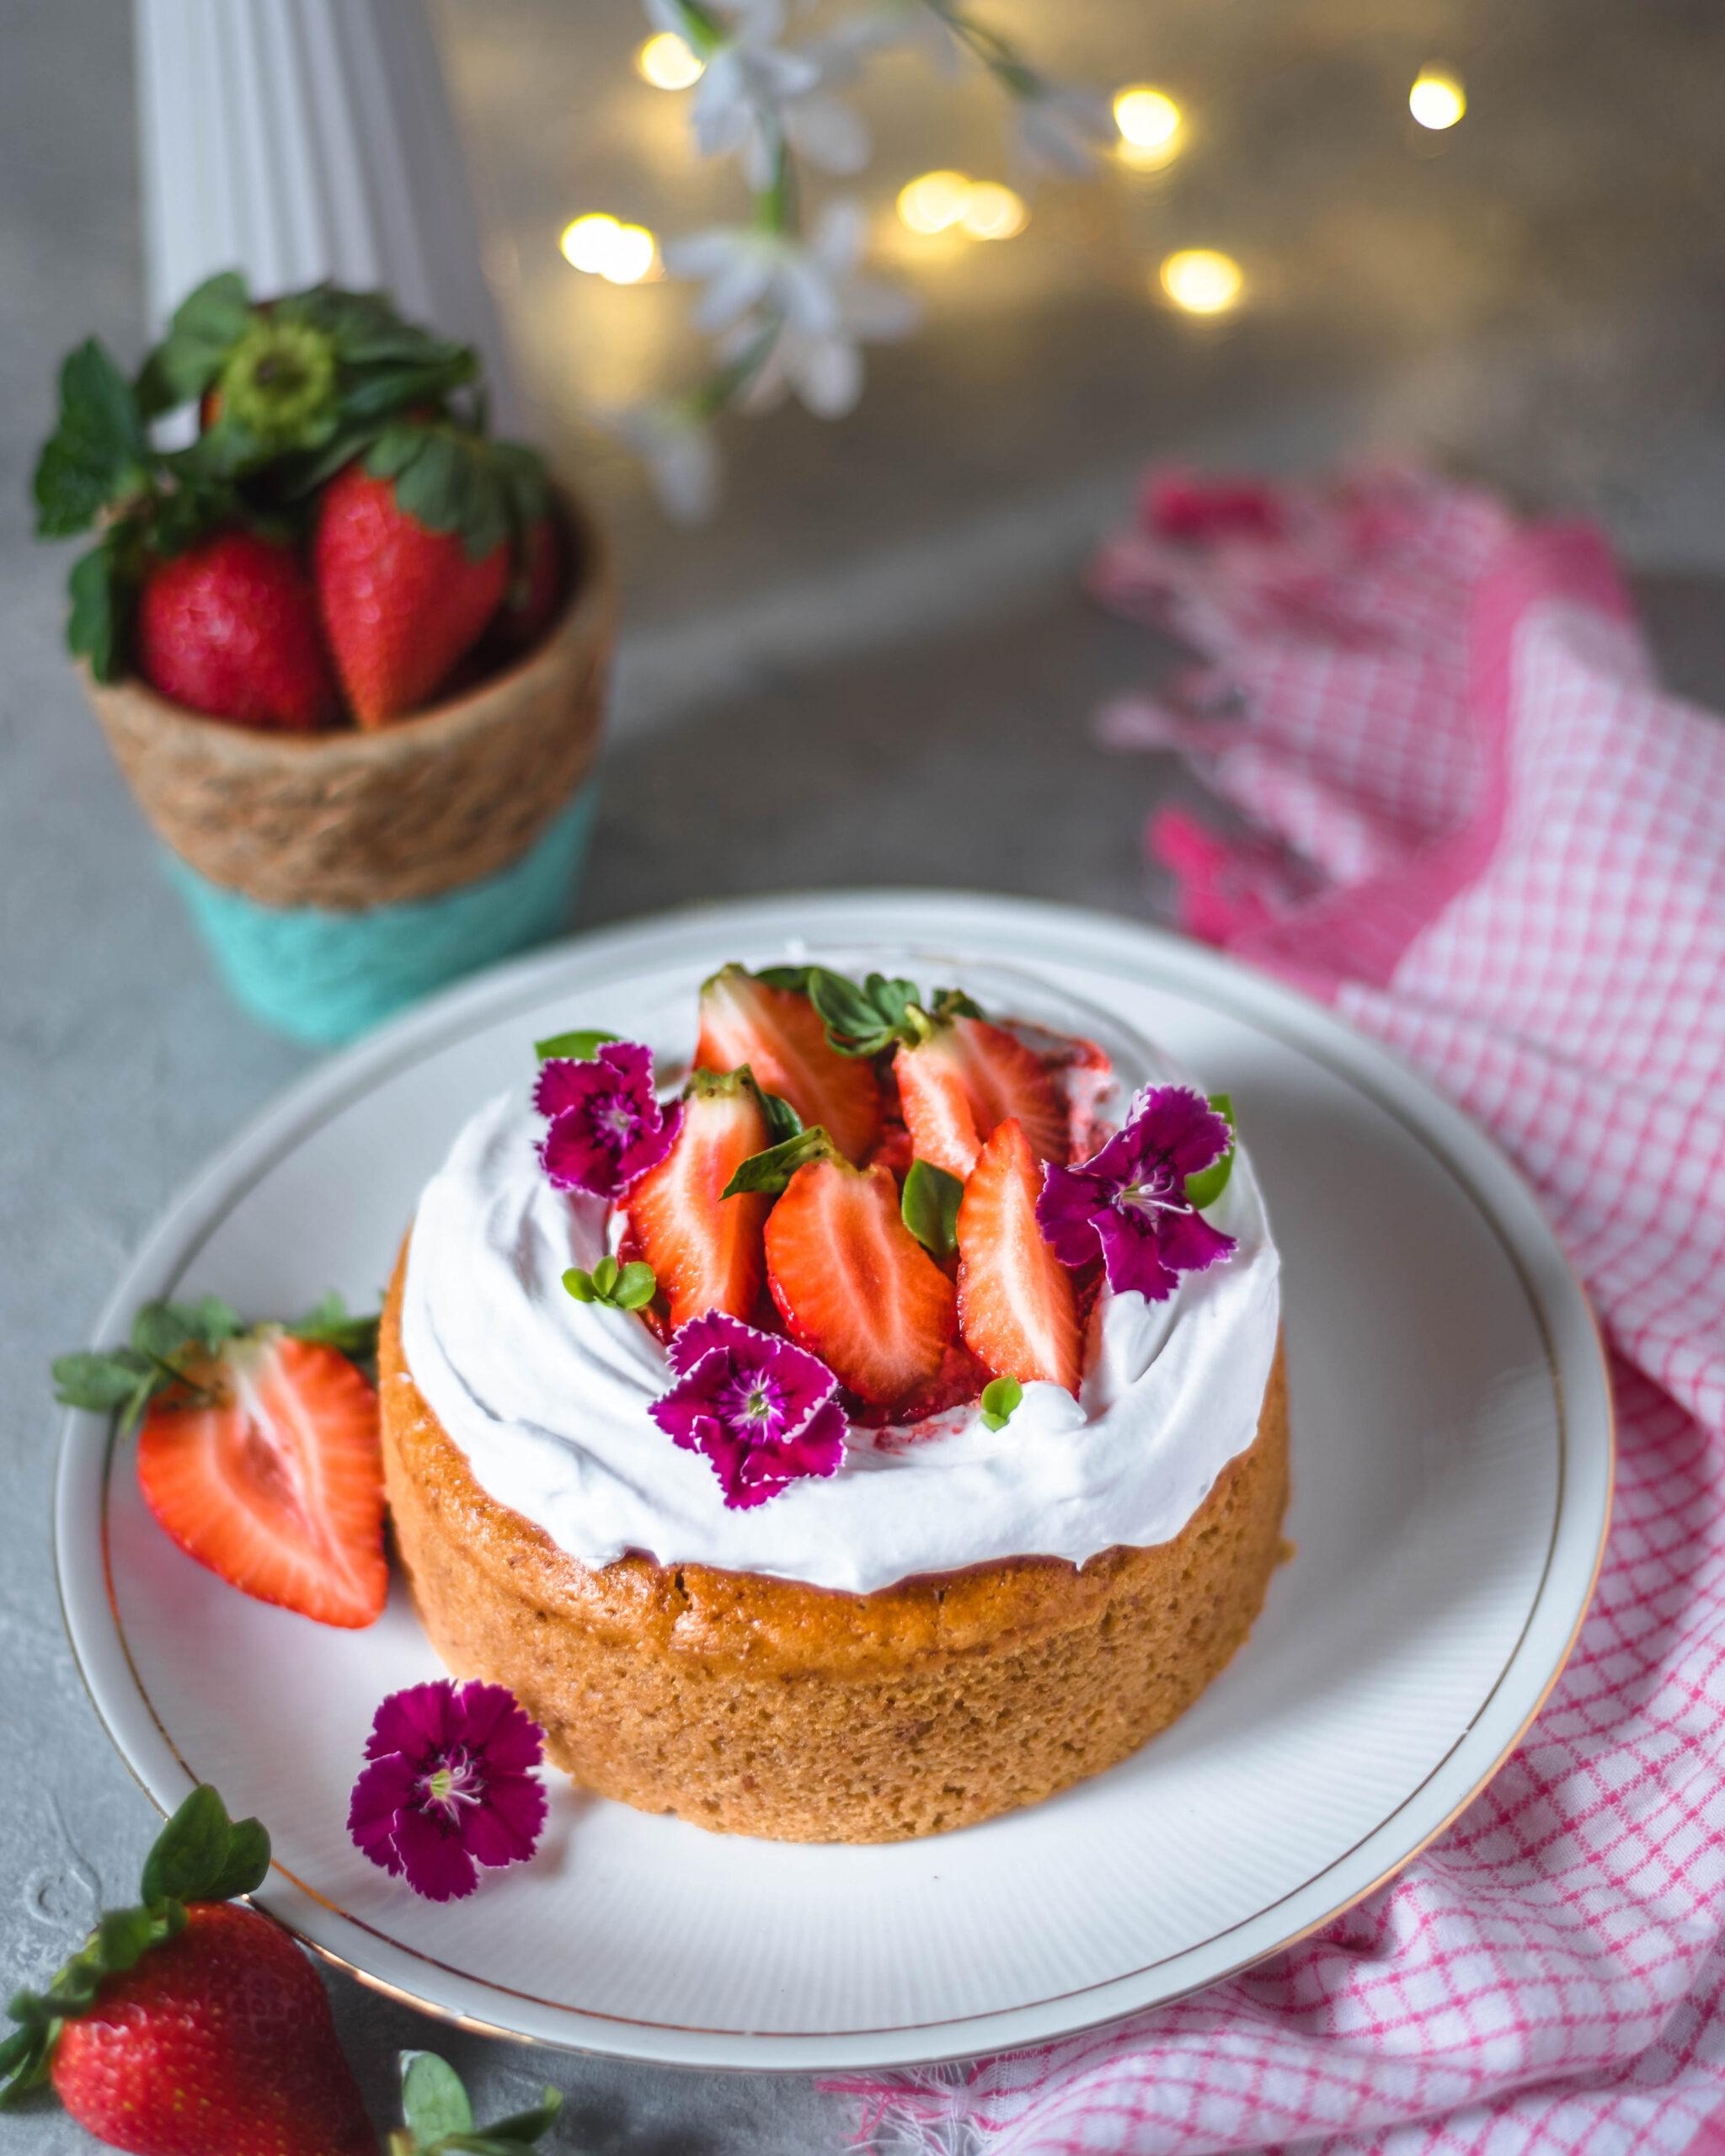 eggless strawberry cake, strawberry cake, easy strawberry cake, strawberry cake recipe, eggless cake, eggless cake recipe, easy eggless cake, easy dessert recipe, cake photography, strawberry recipes